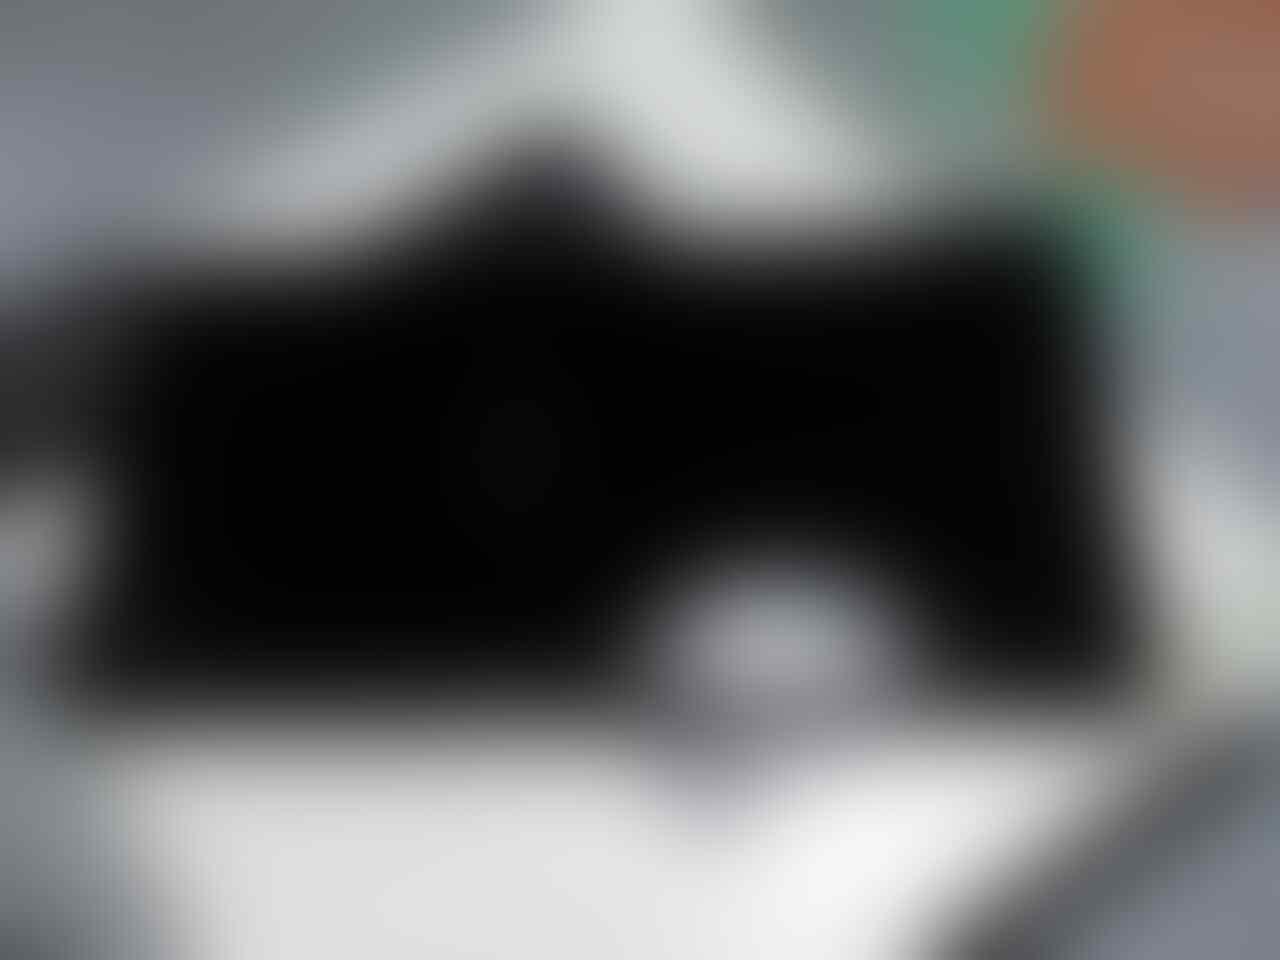 jual sony xperia z1 c6903 black mulus lengkap murah